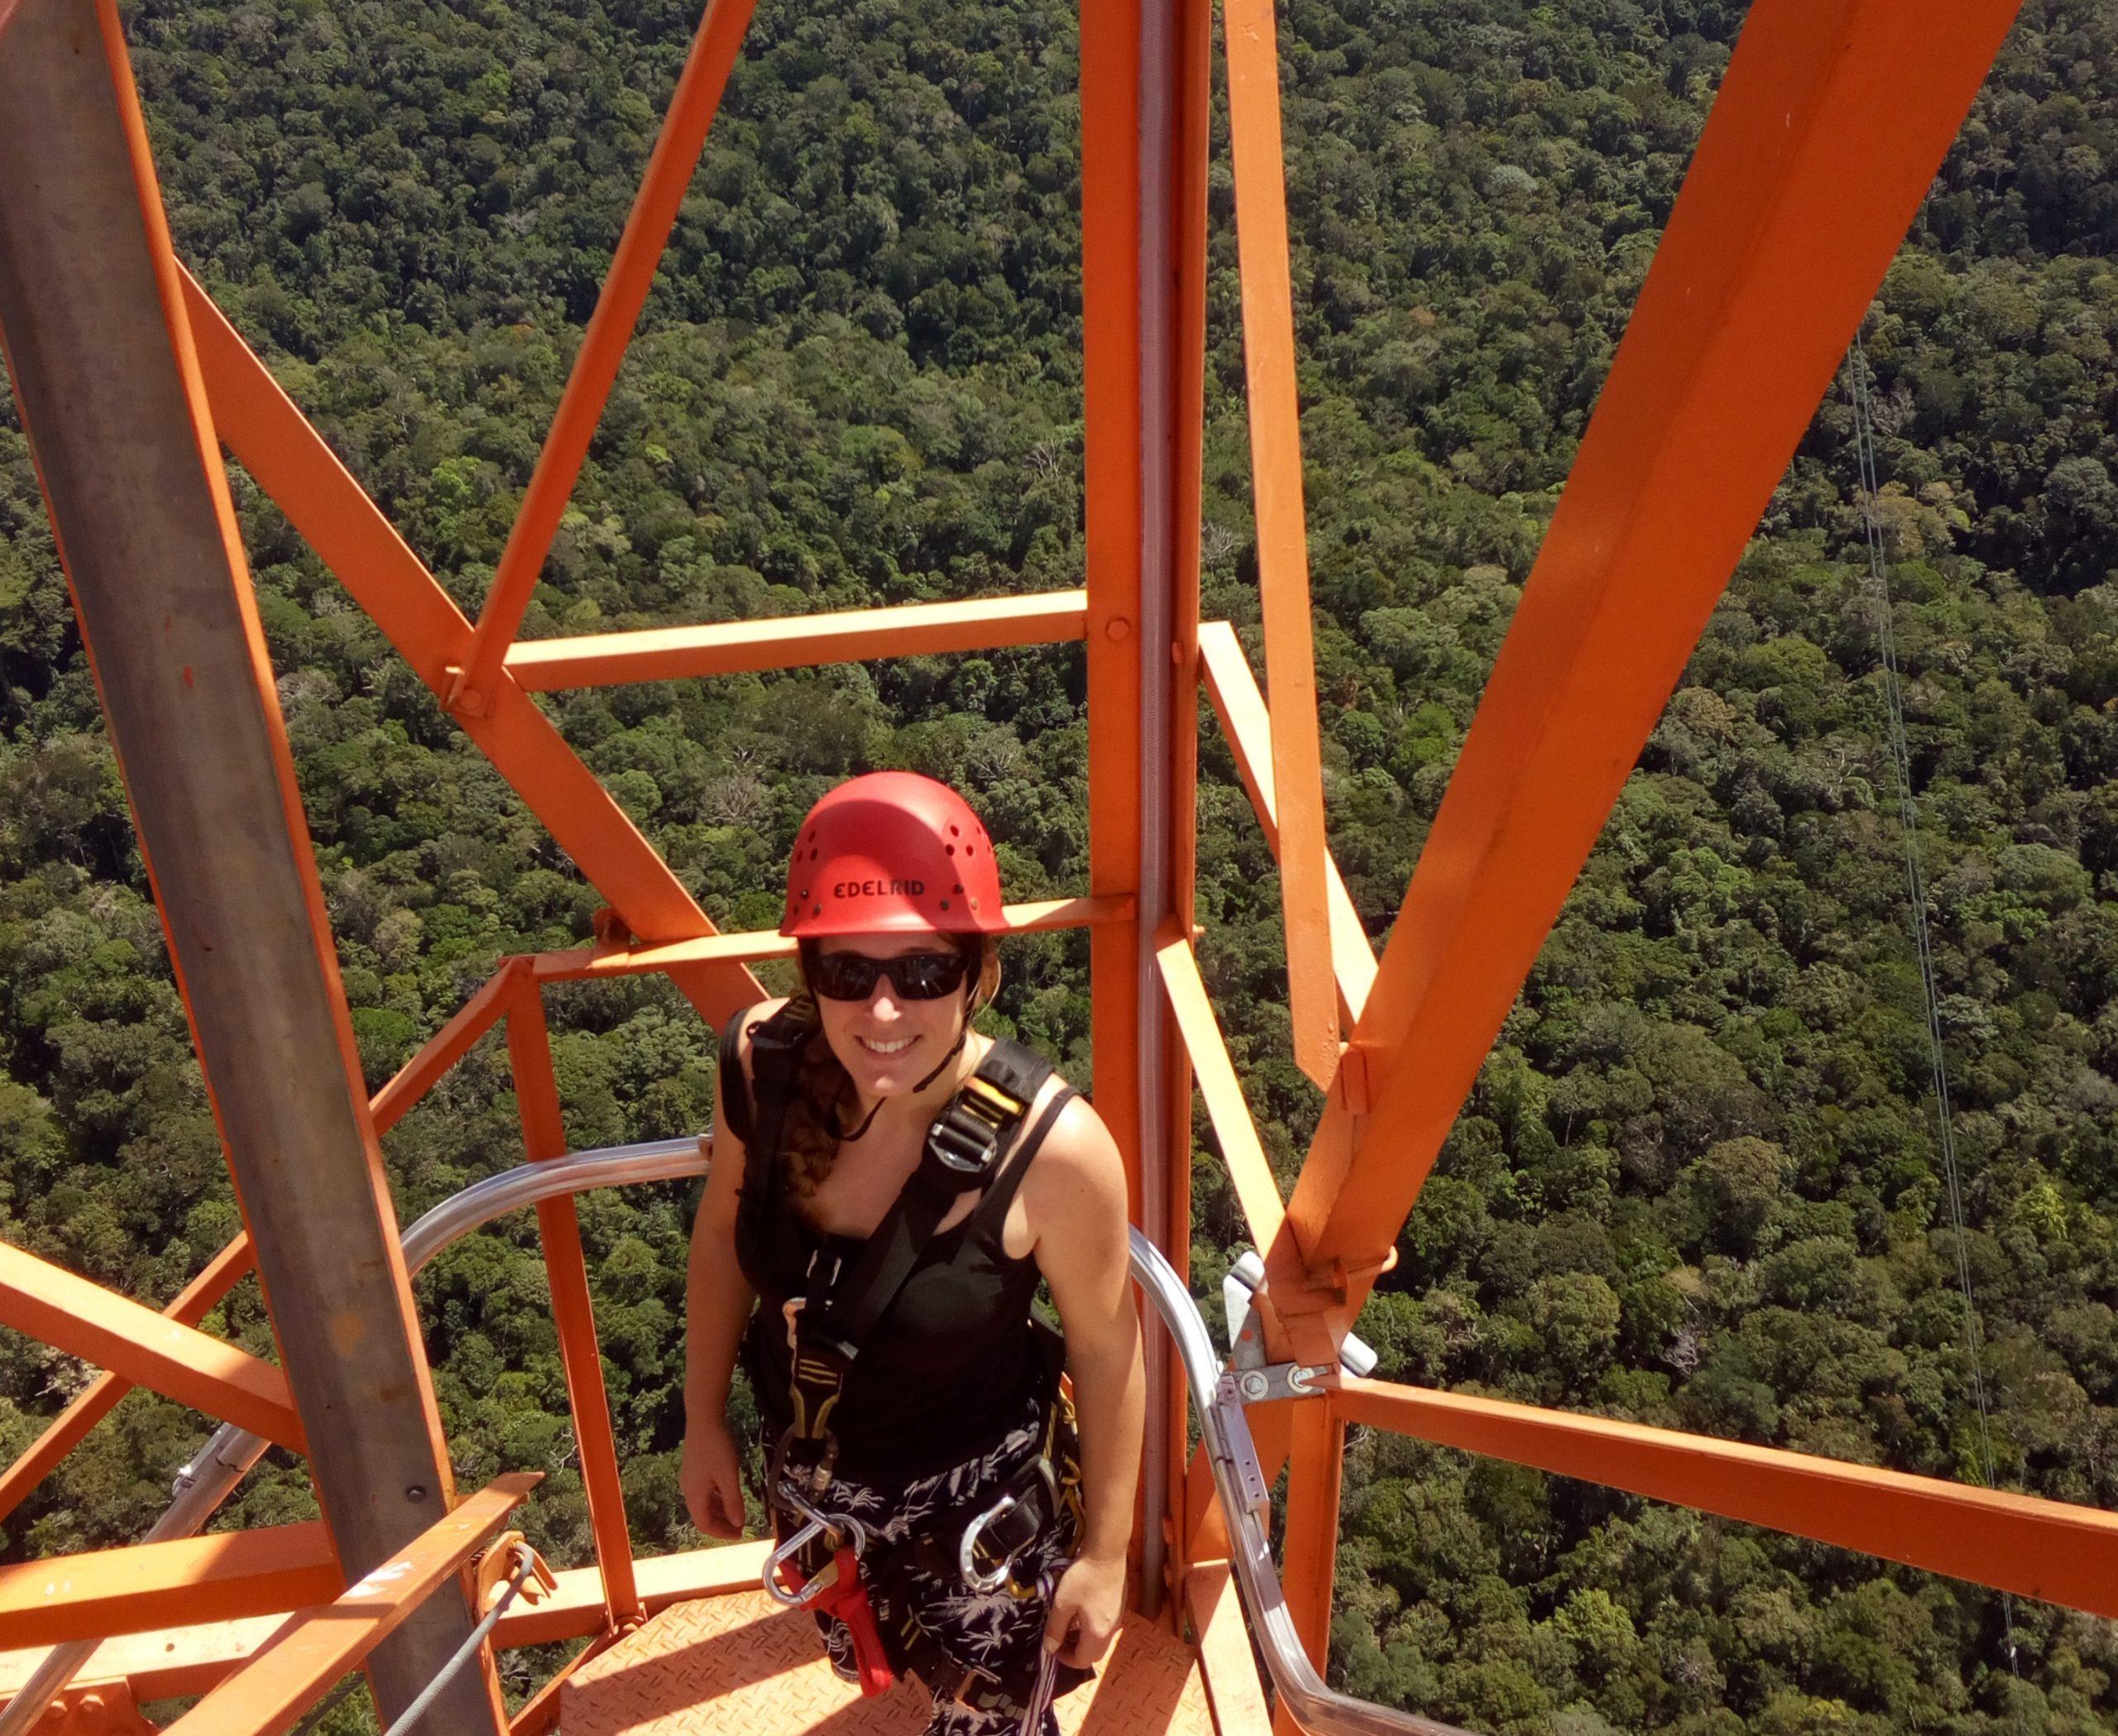 PostDoc Hella on the ATTO tall tower